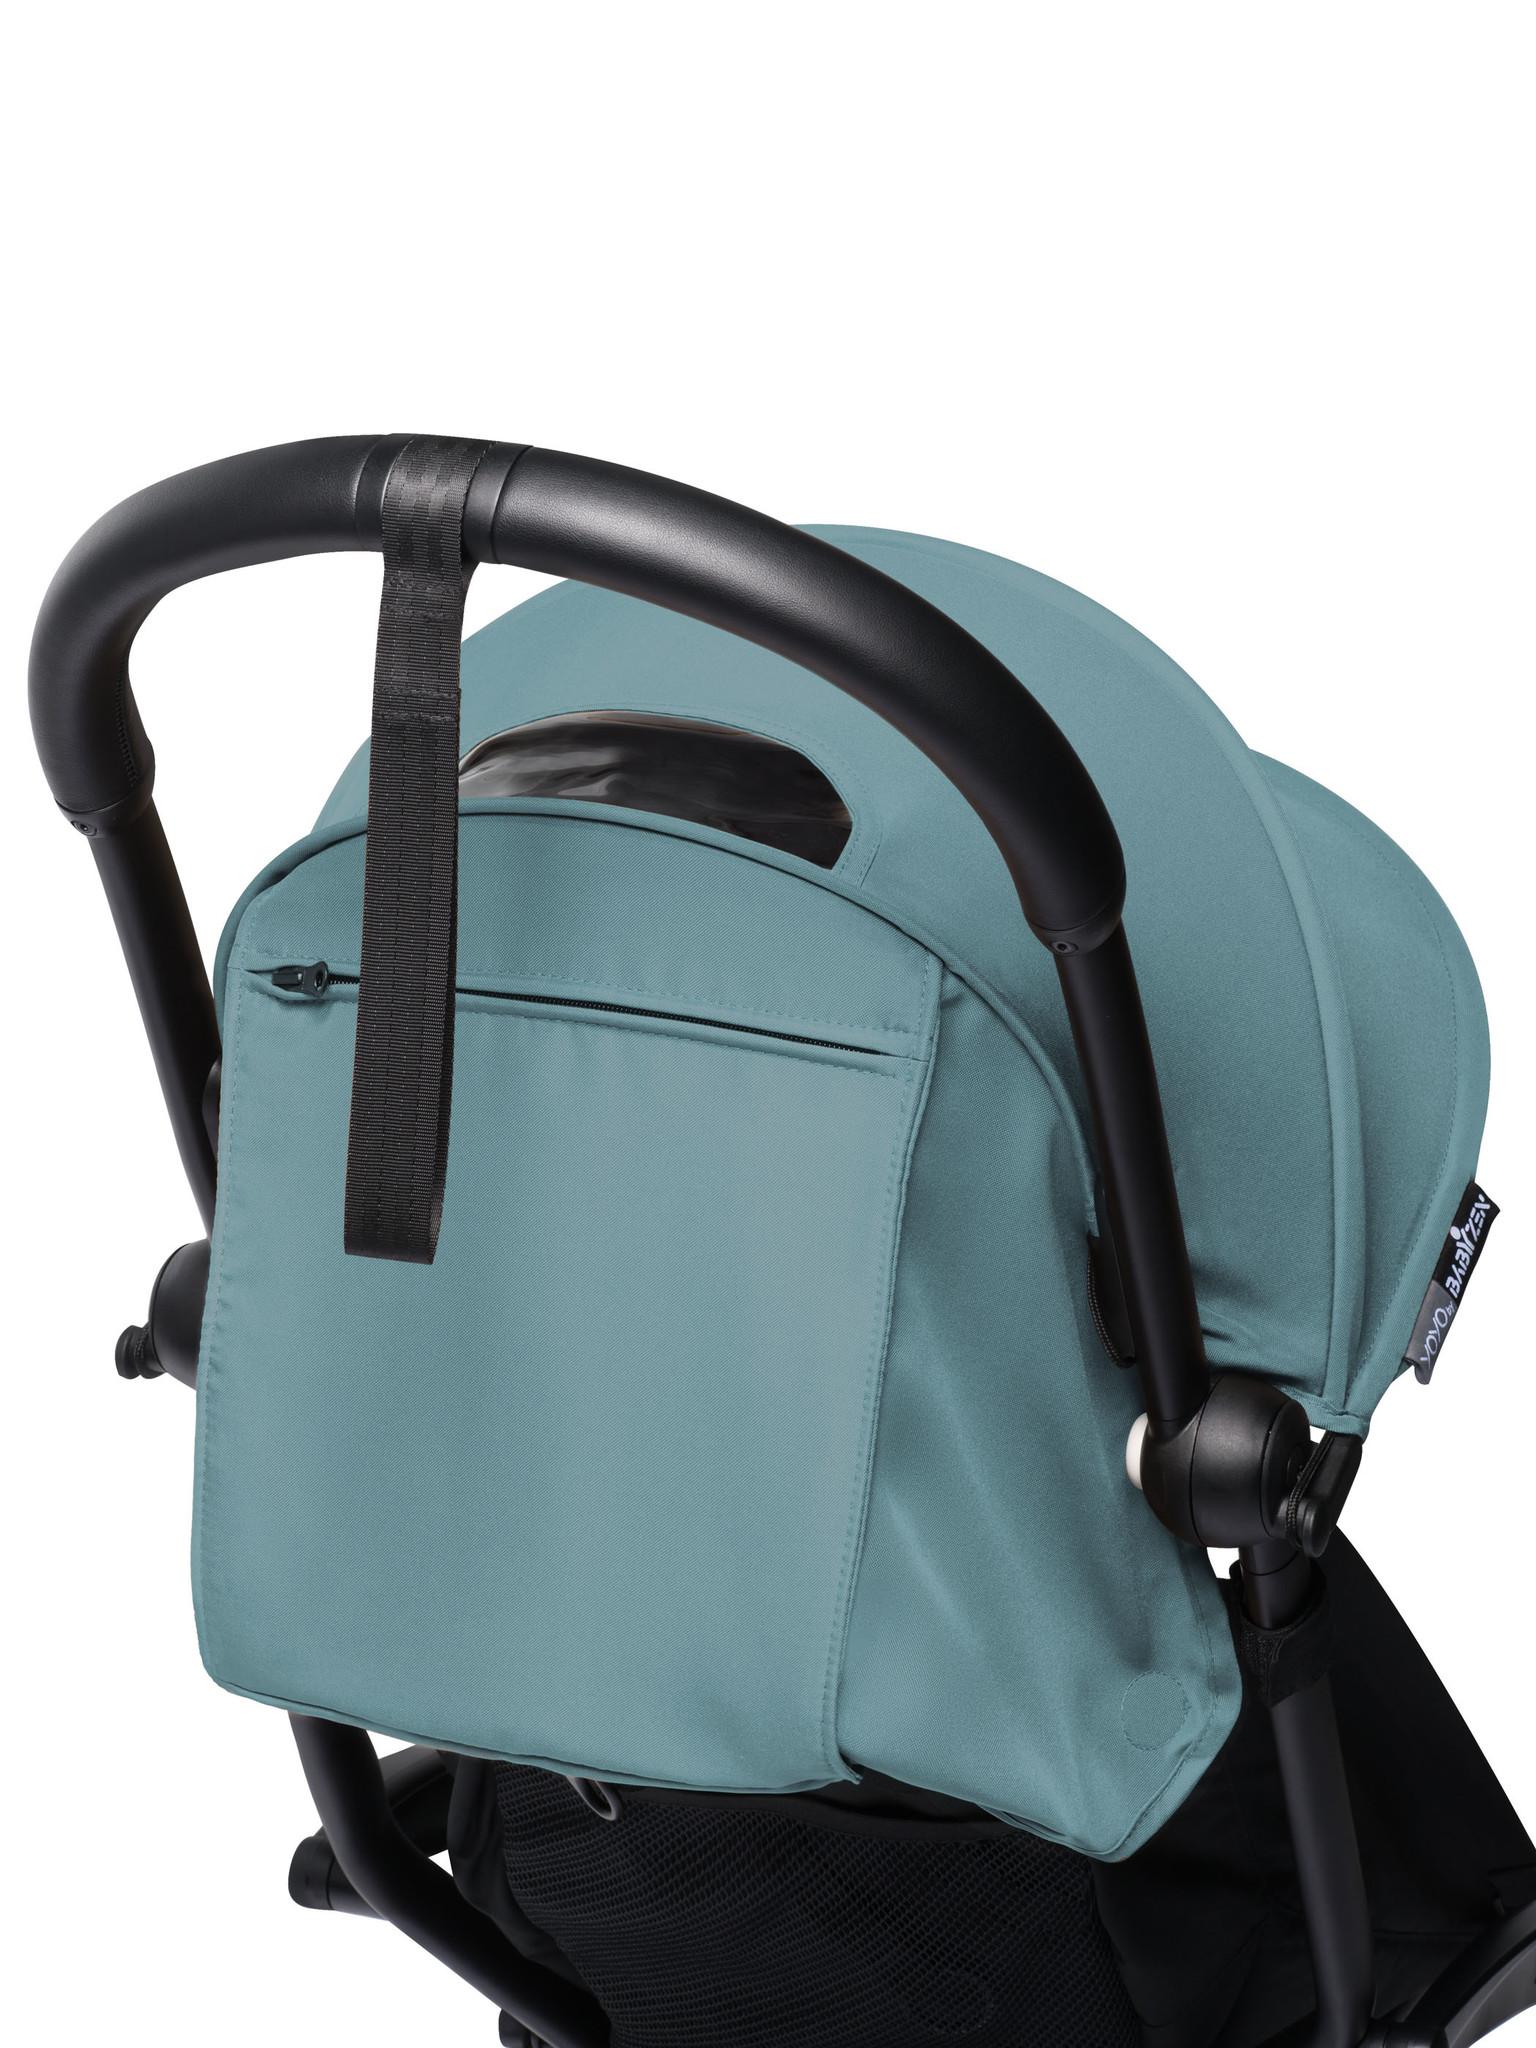 Babyzen Babyzen YOYO² buggy COMPLEET / FULL SET 0+ and 6+ aqua frame zwart incl. YOYO² BeSafe autostoel zwart